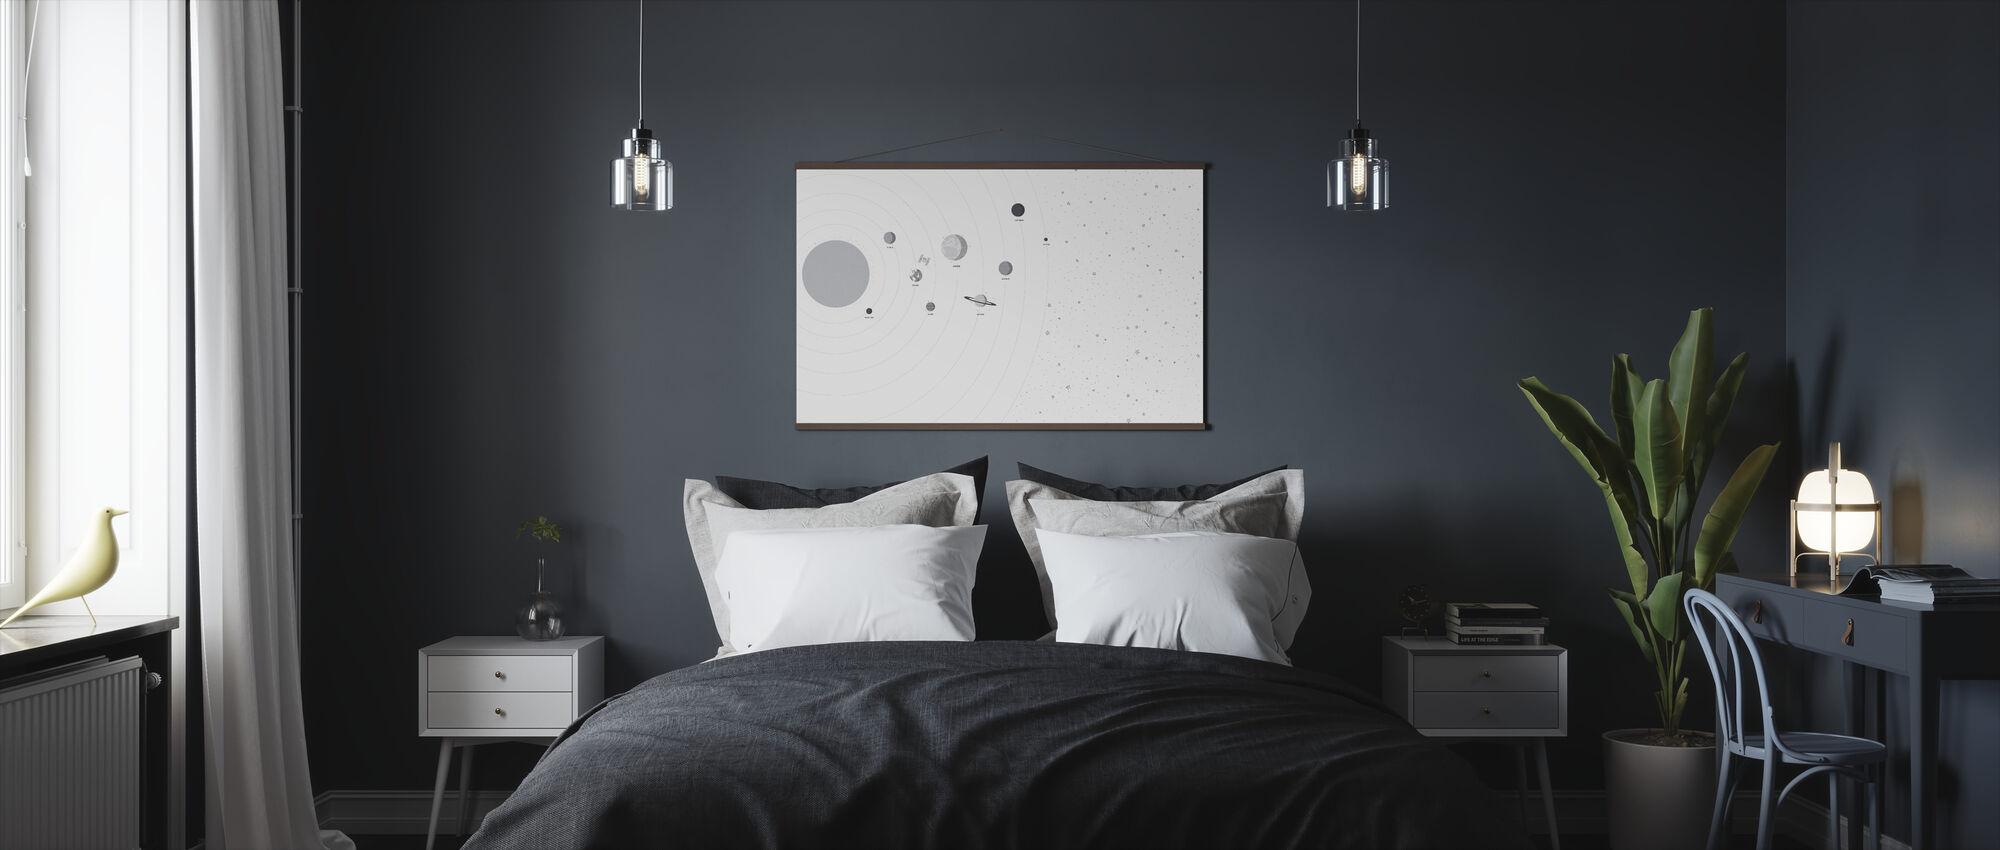 Planeten en sterren - Poster - Slaapkamer